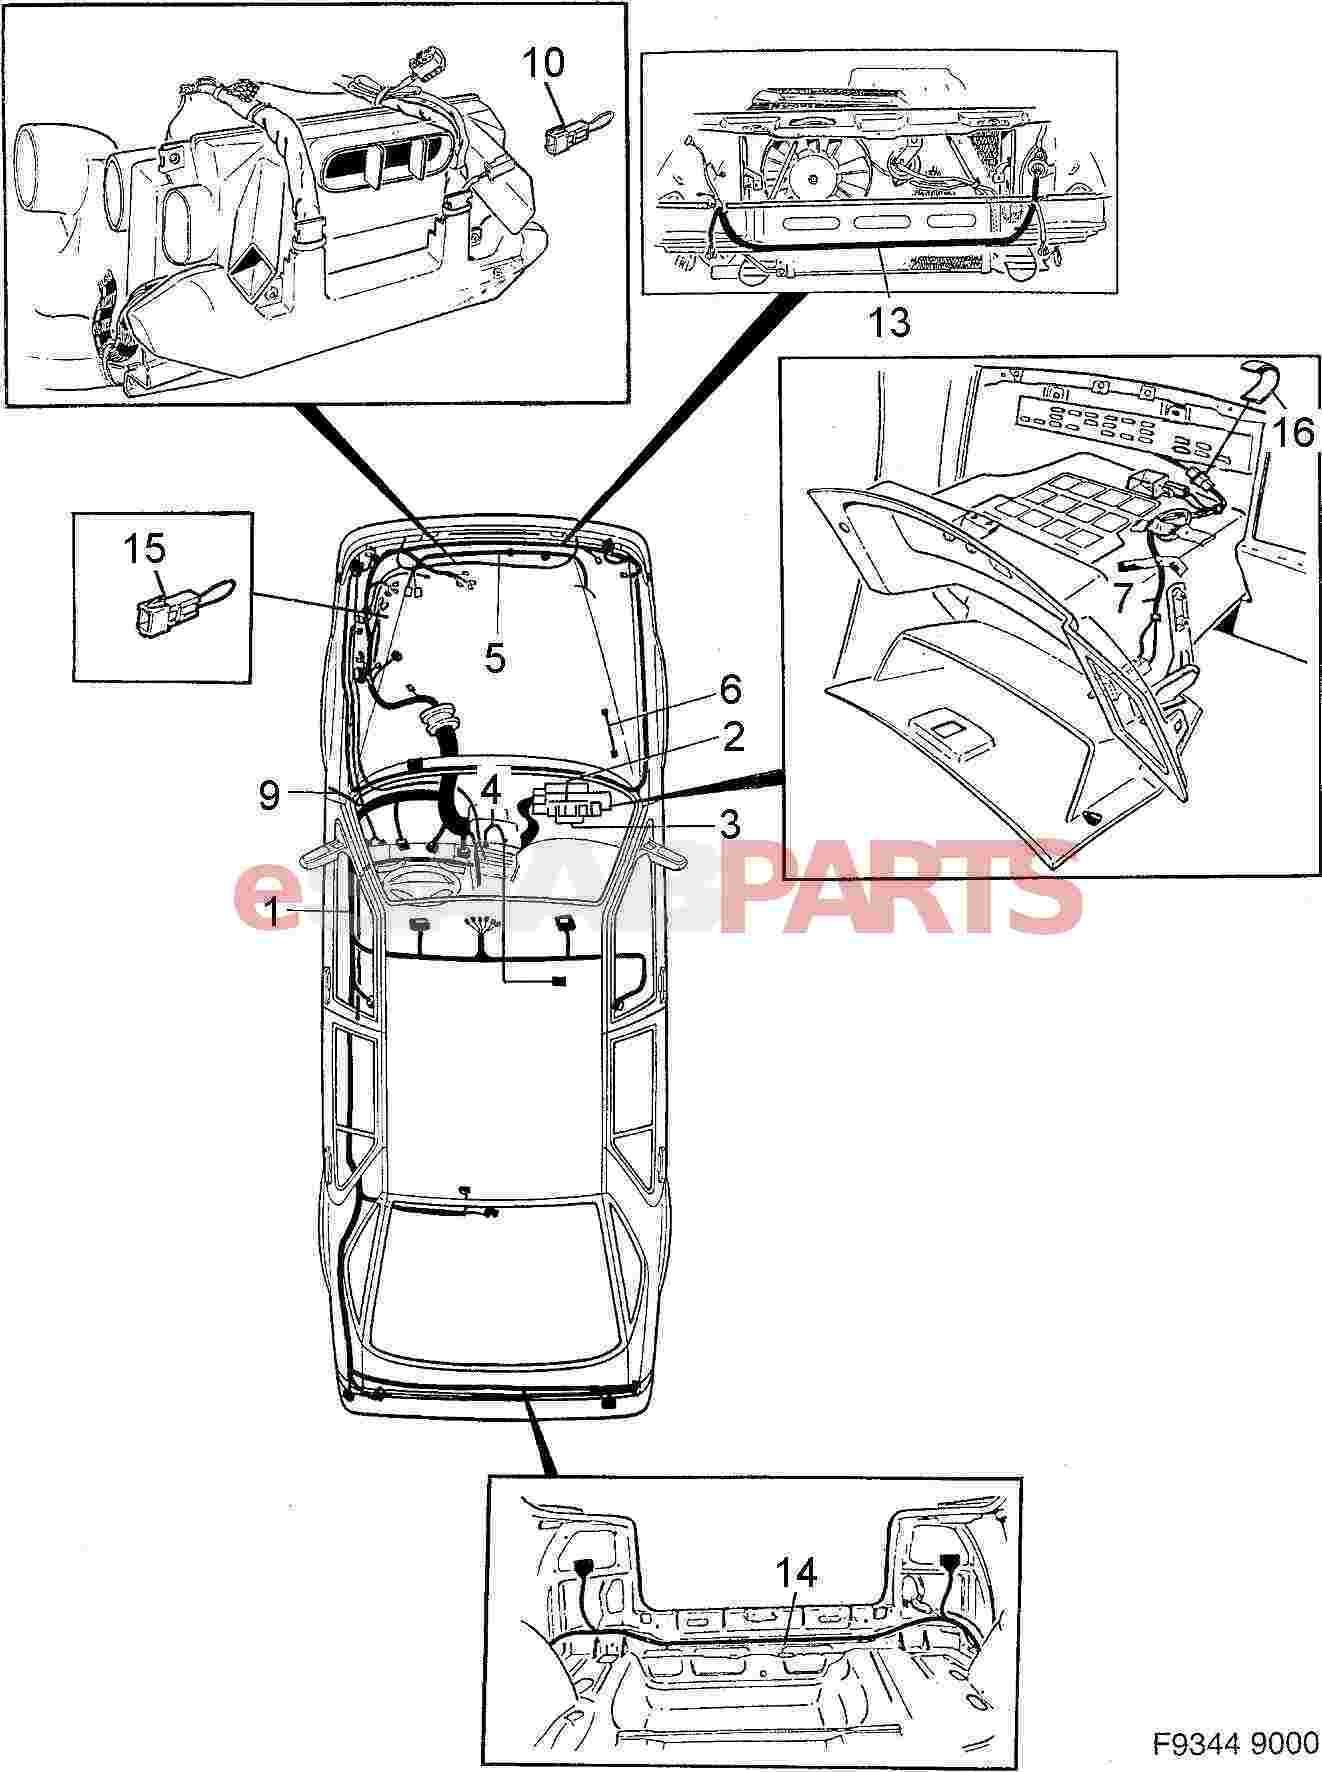 Saab 9000 Wiring Harness Download Diagrams Esaabparts Com U003e Electrical Parts Rh Gm Radio Diagram Scosche Stereo